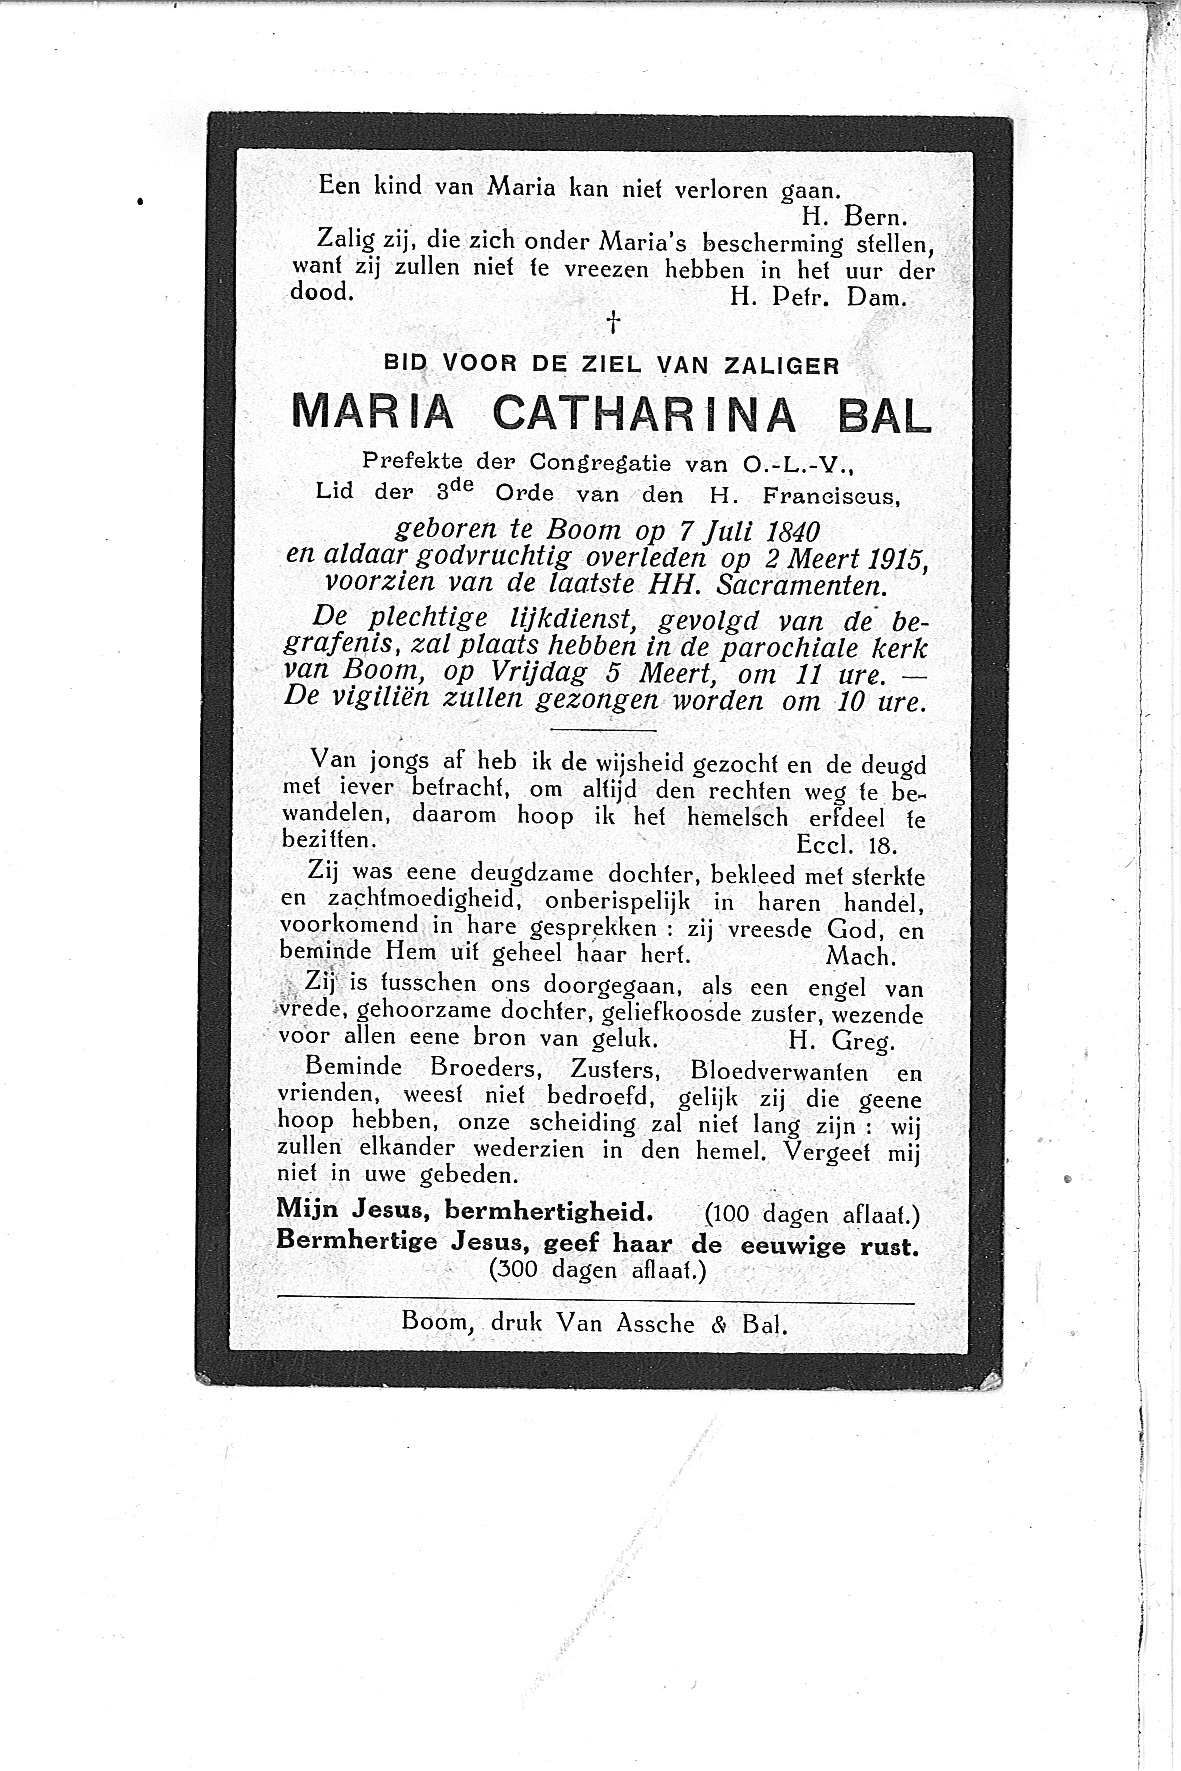 Maria-Catharina(1915)20101006133005_00037.jpg